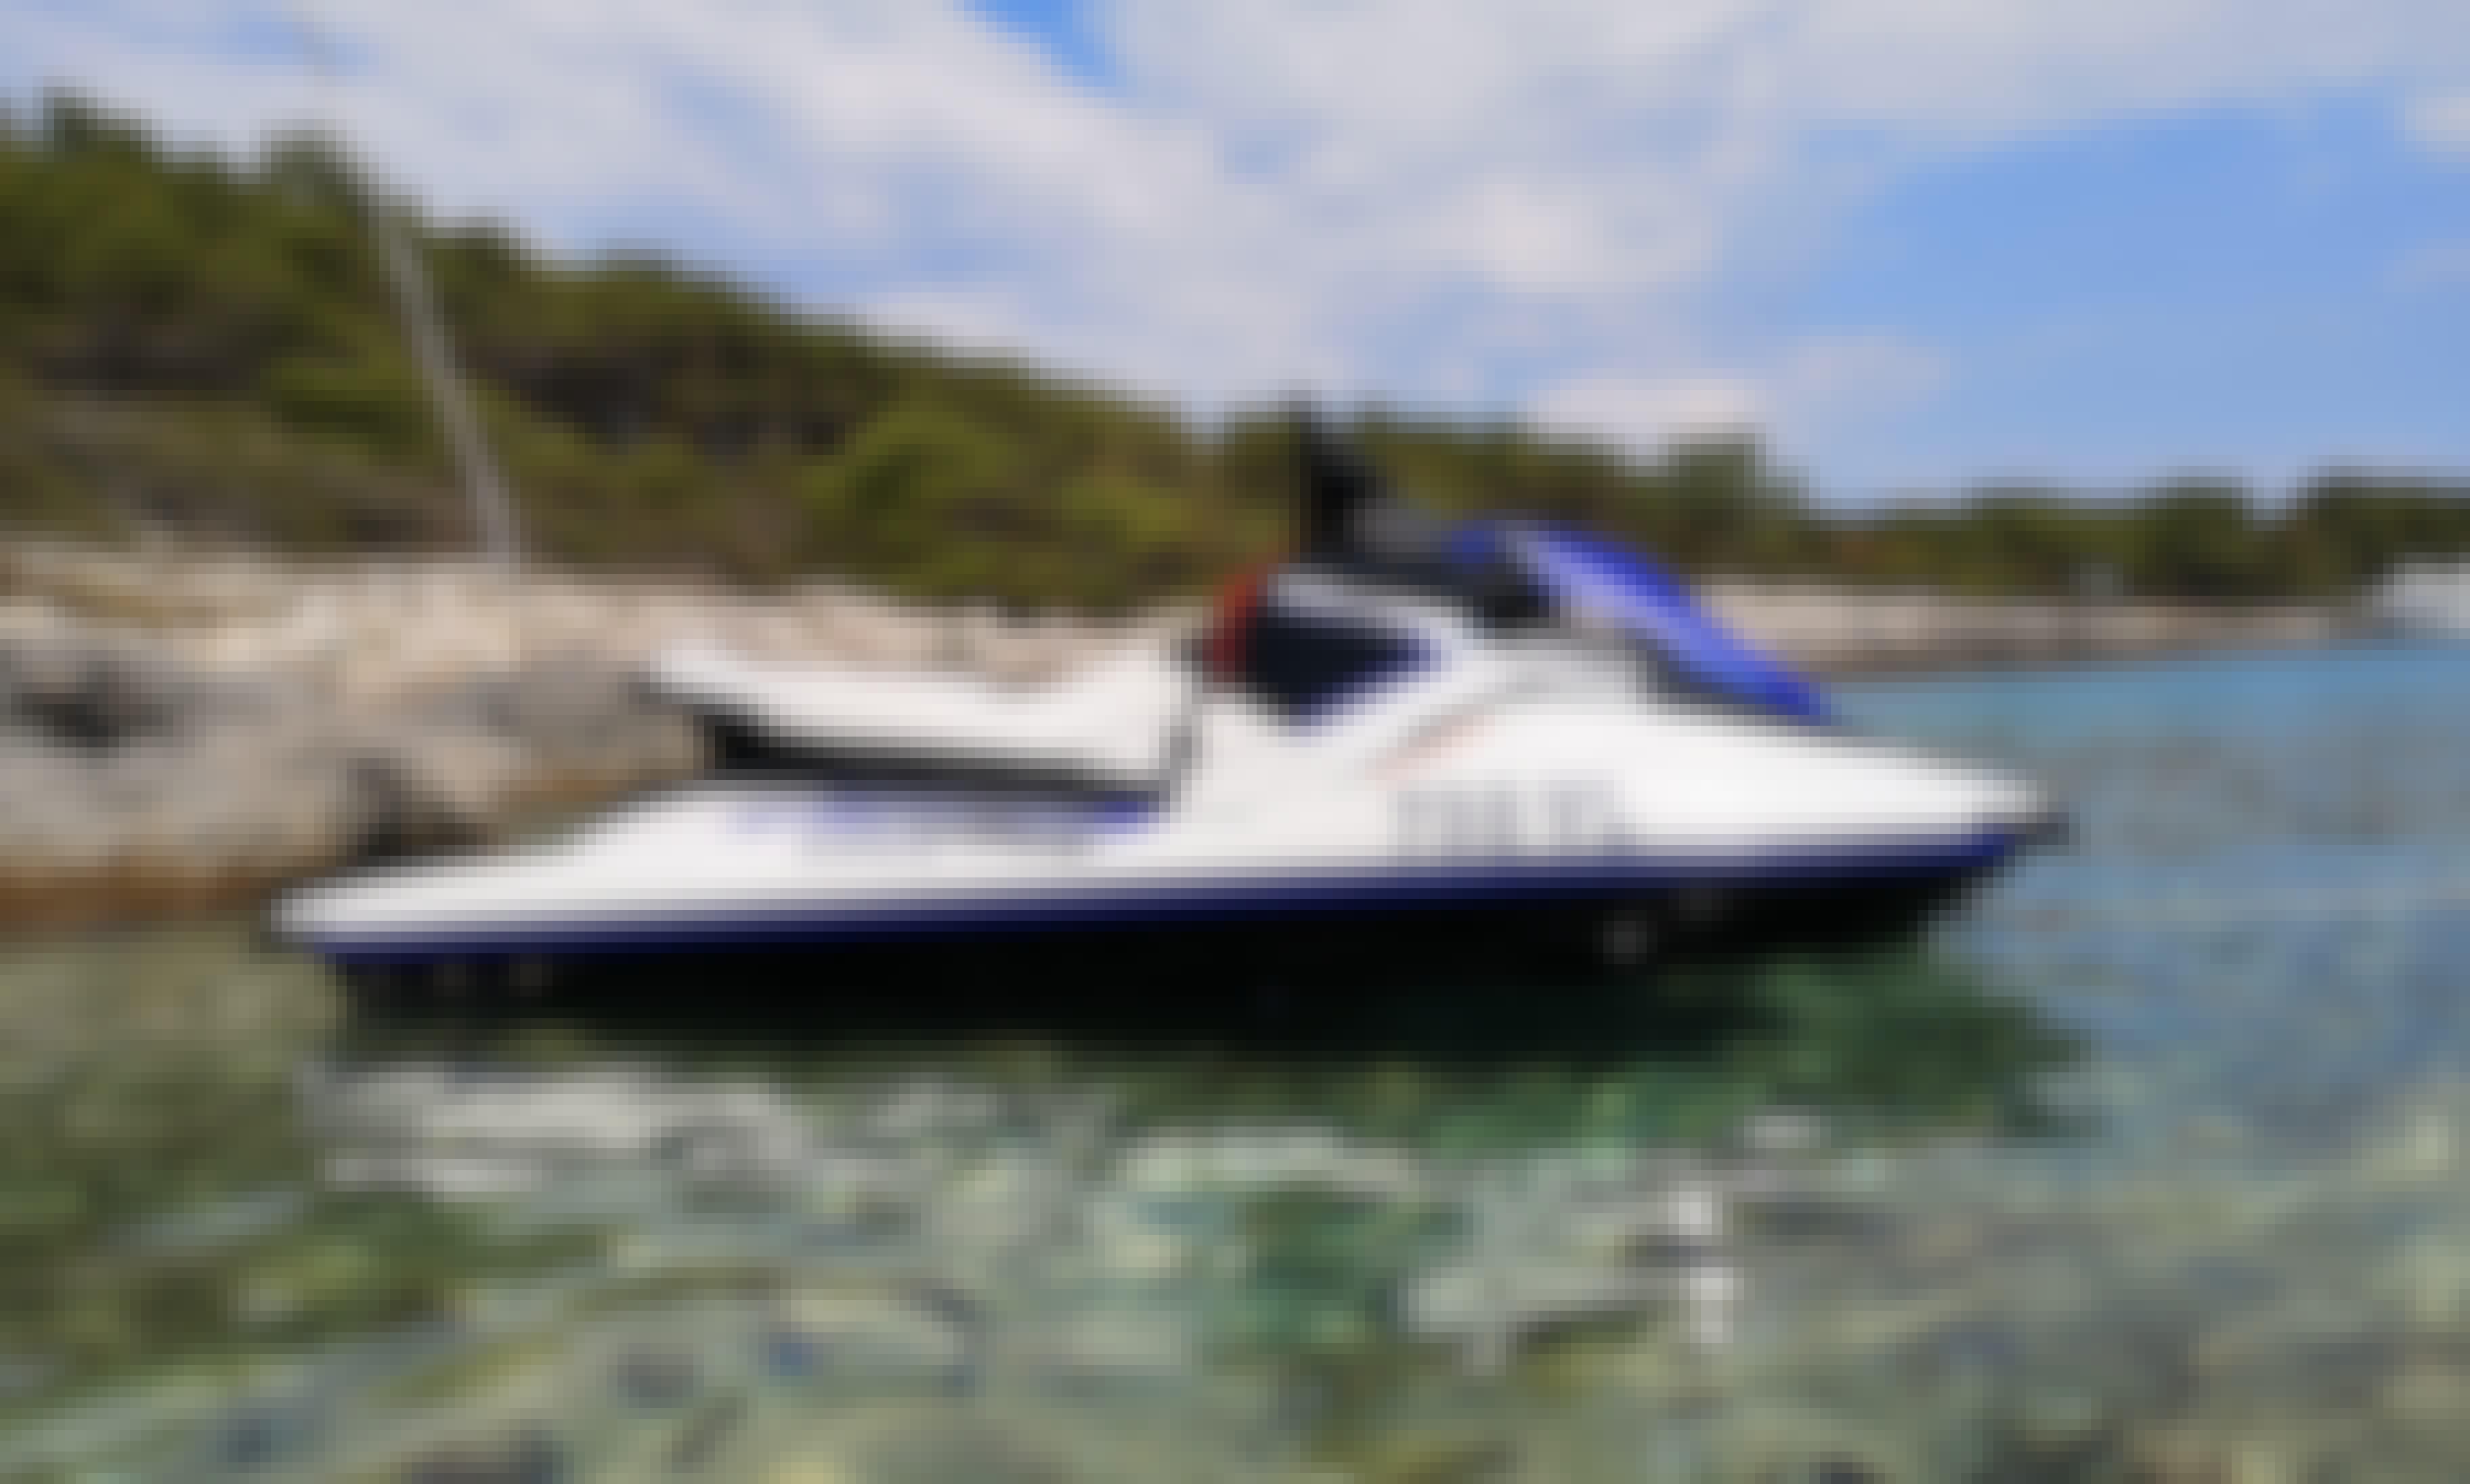 Jet Ski YAMAHA EX Sport 2019 for Rent in Vela Luka, Croatia